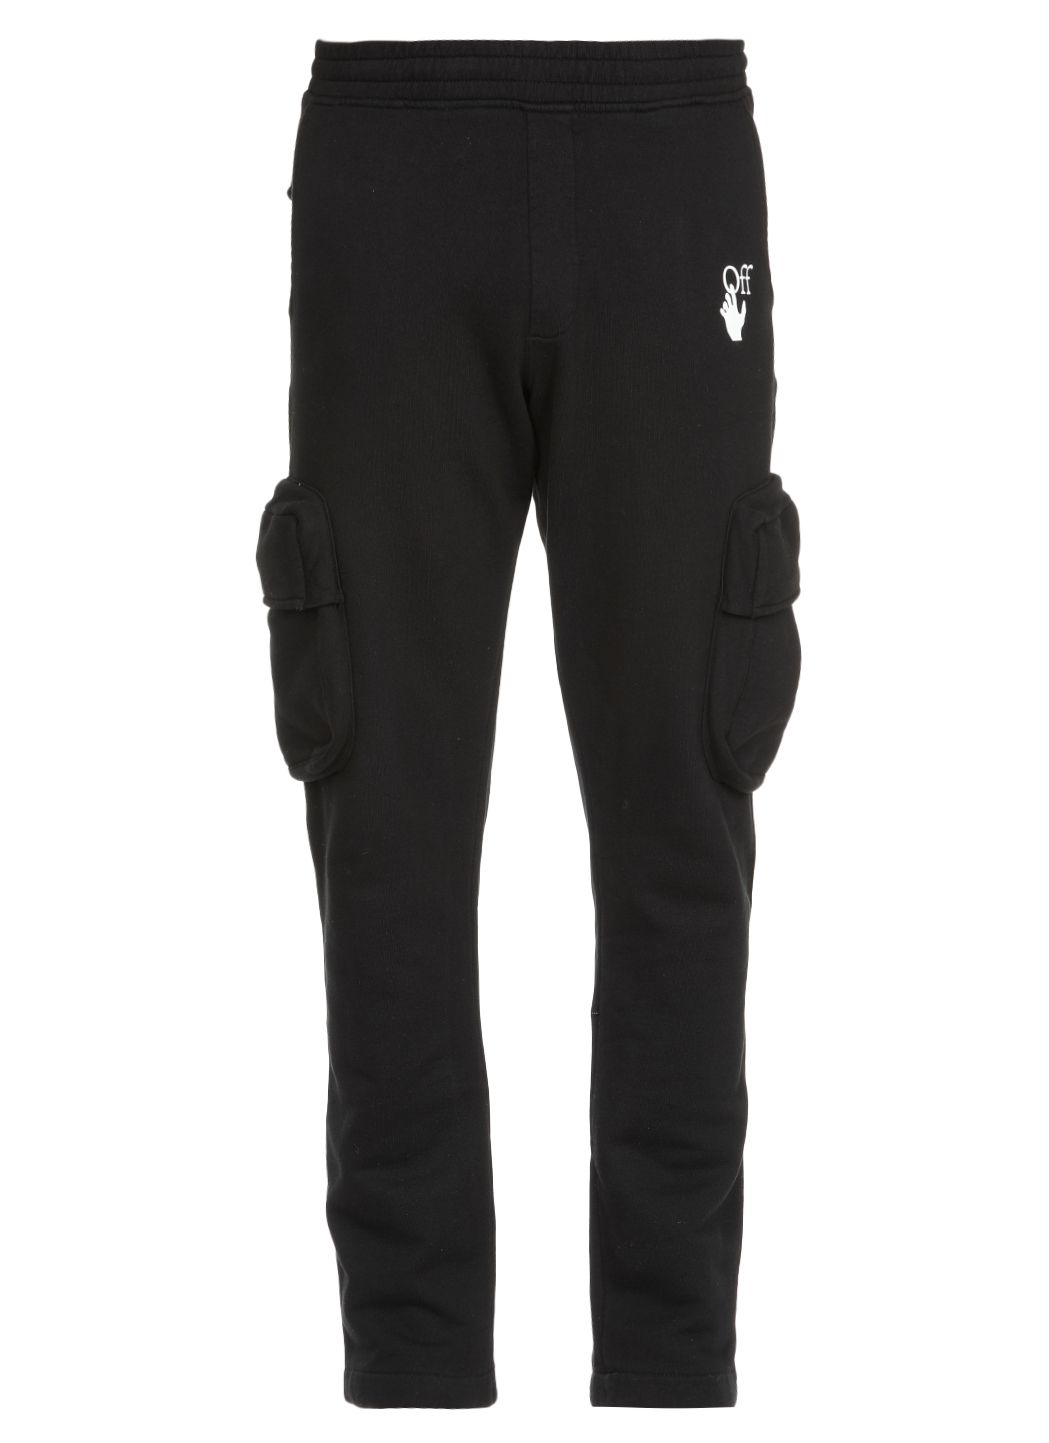 Marker pants